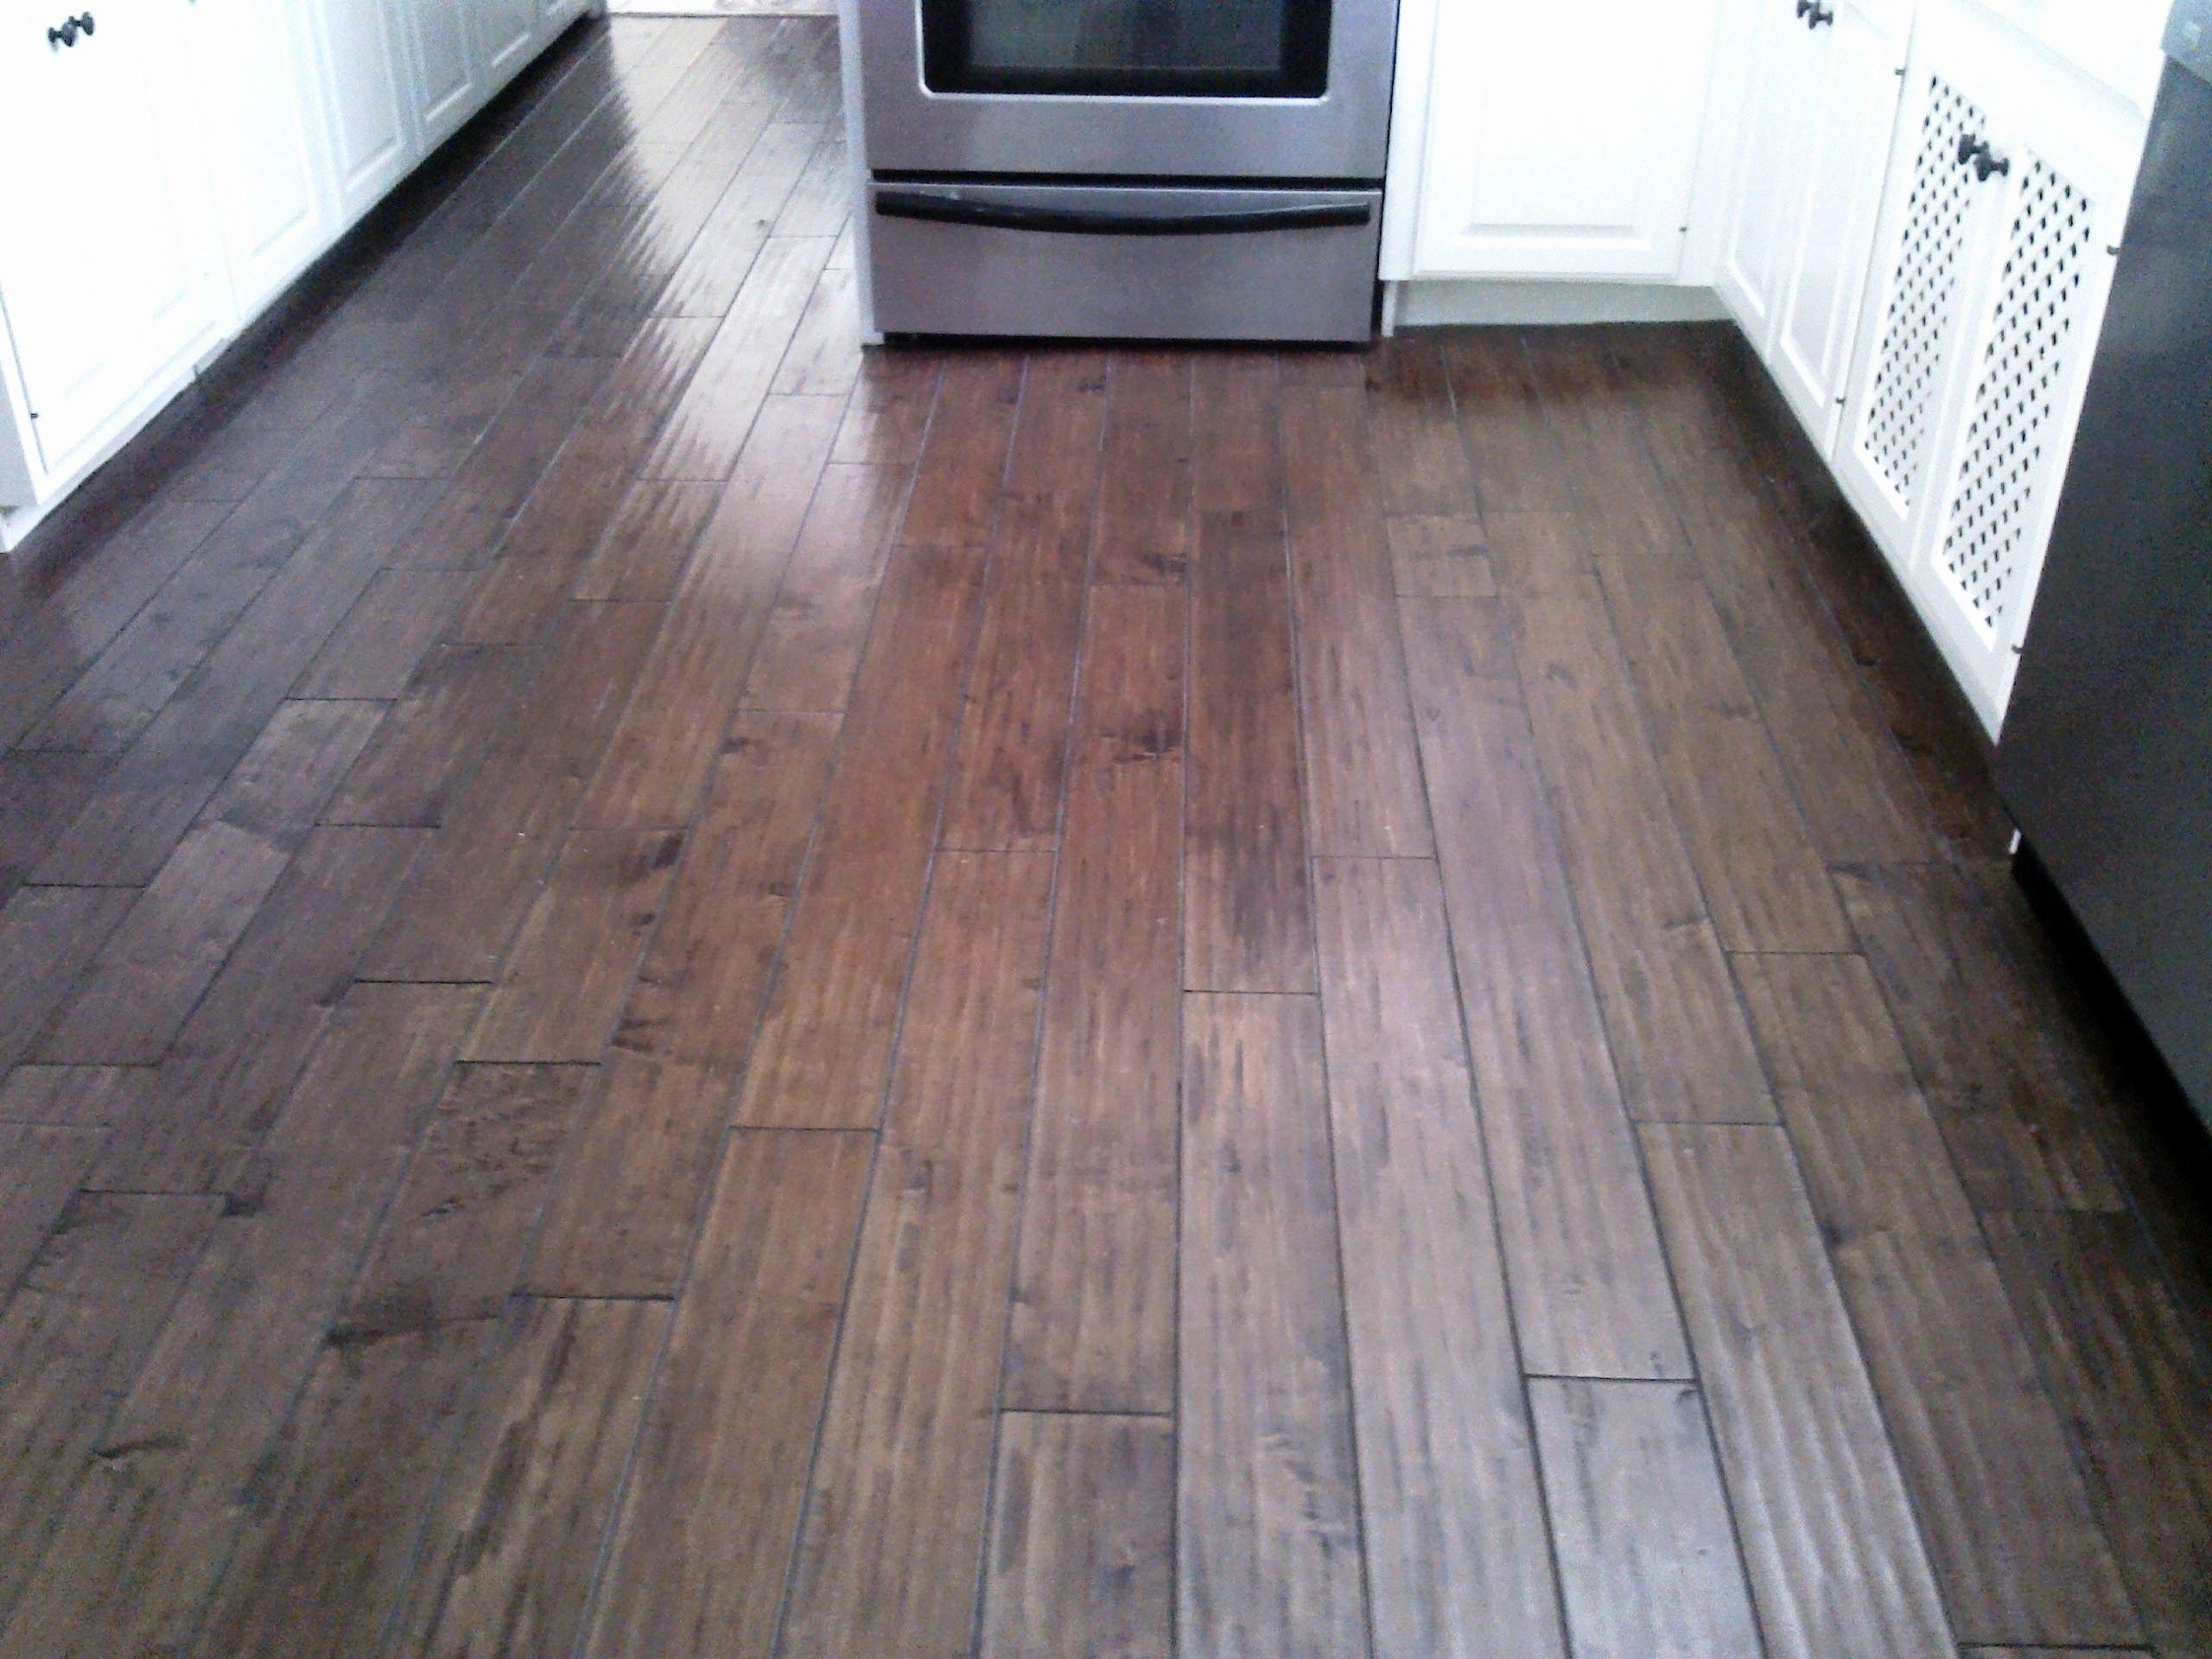 Hand Scraped Hardwood Laminate Flooring Of Stain Laminate Floors Elegant Awesome Wood Flooring Laminate Great In Stain Laminate Floors Beautiful Ceramic Tile that Looks Like Hardwood Floor Podemosleganes Image Of Stain